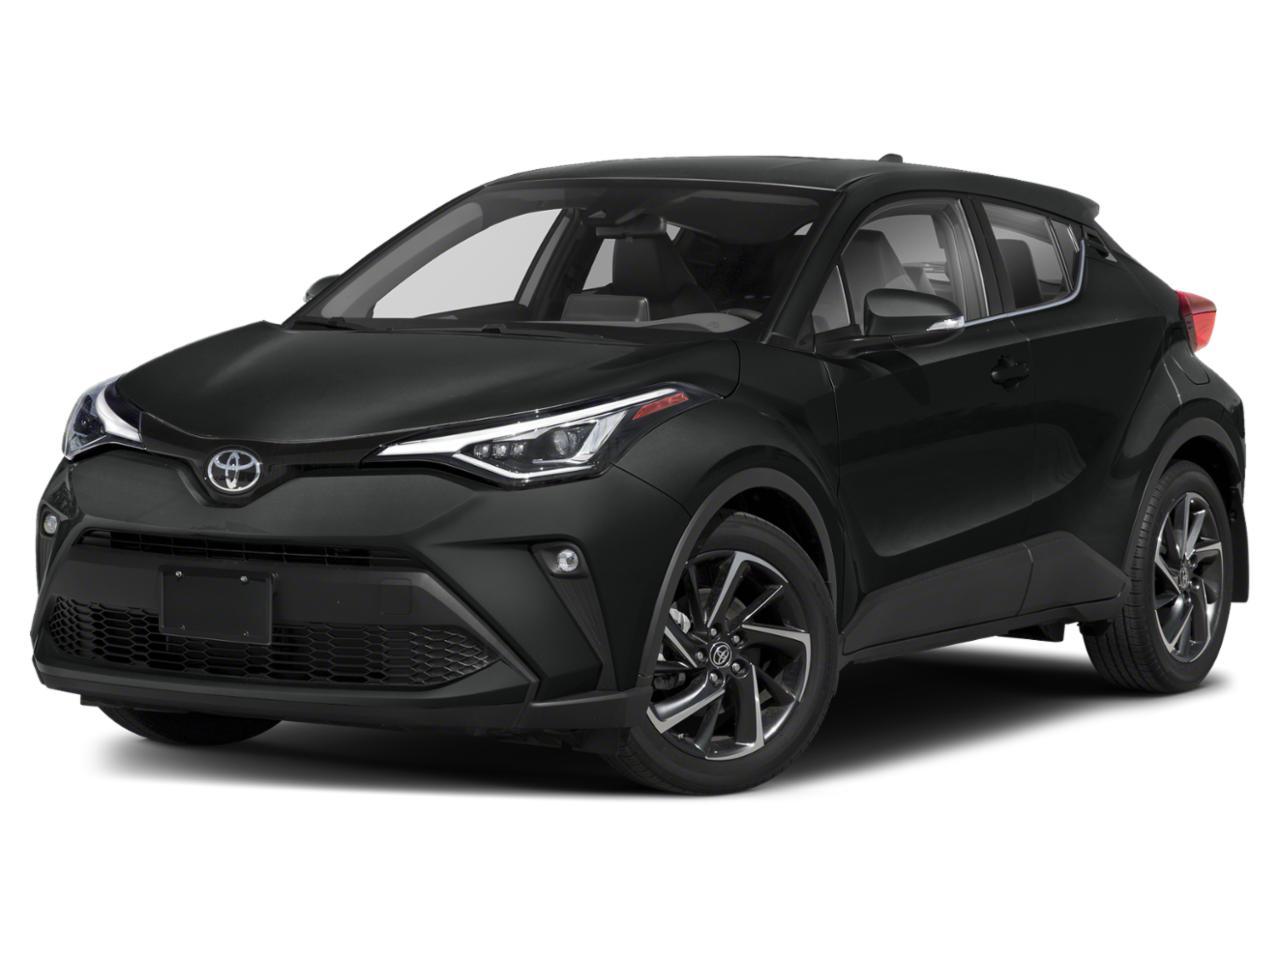 2021 Toyota C-HR Vehicle Photo in Oshkosh, WI 54904